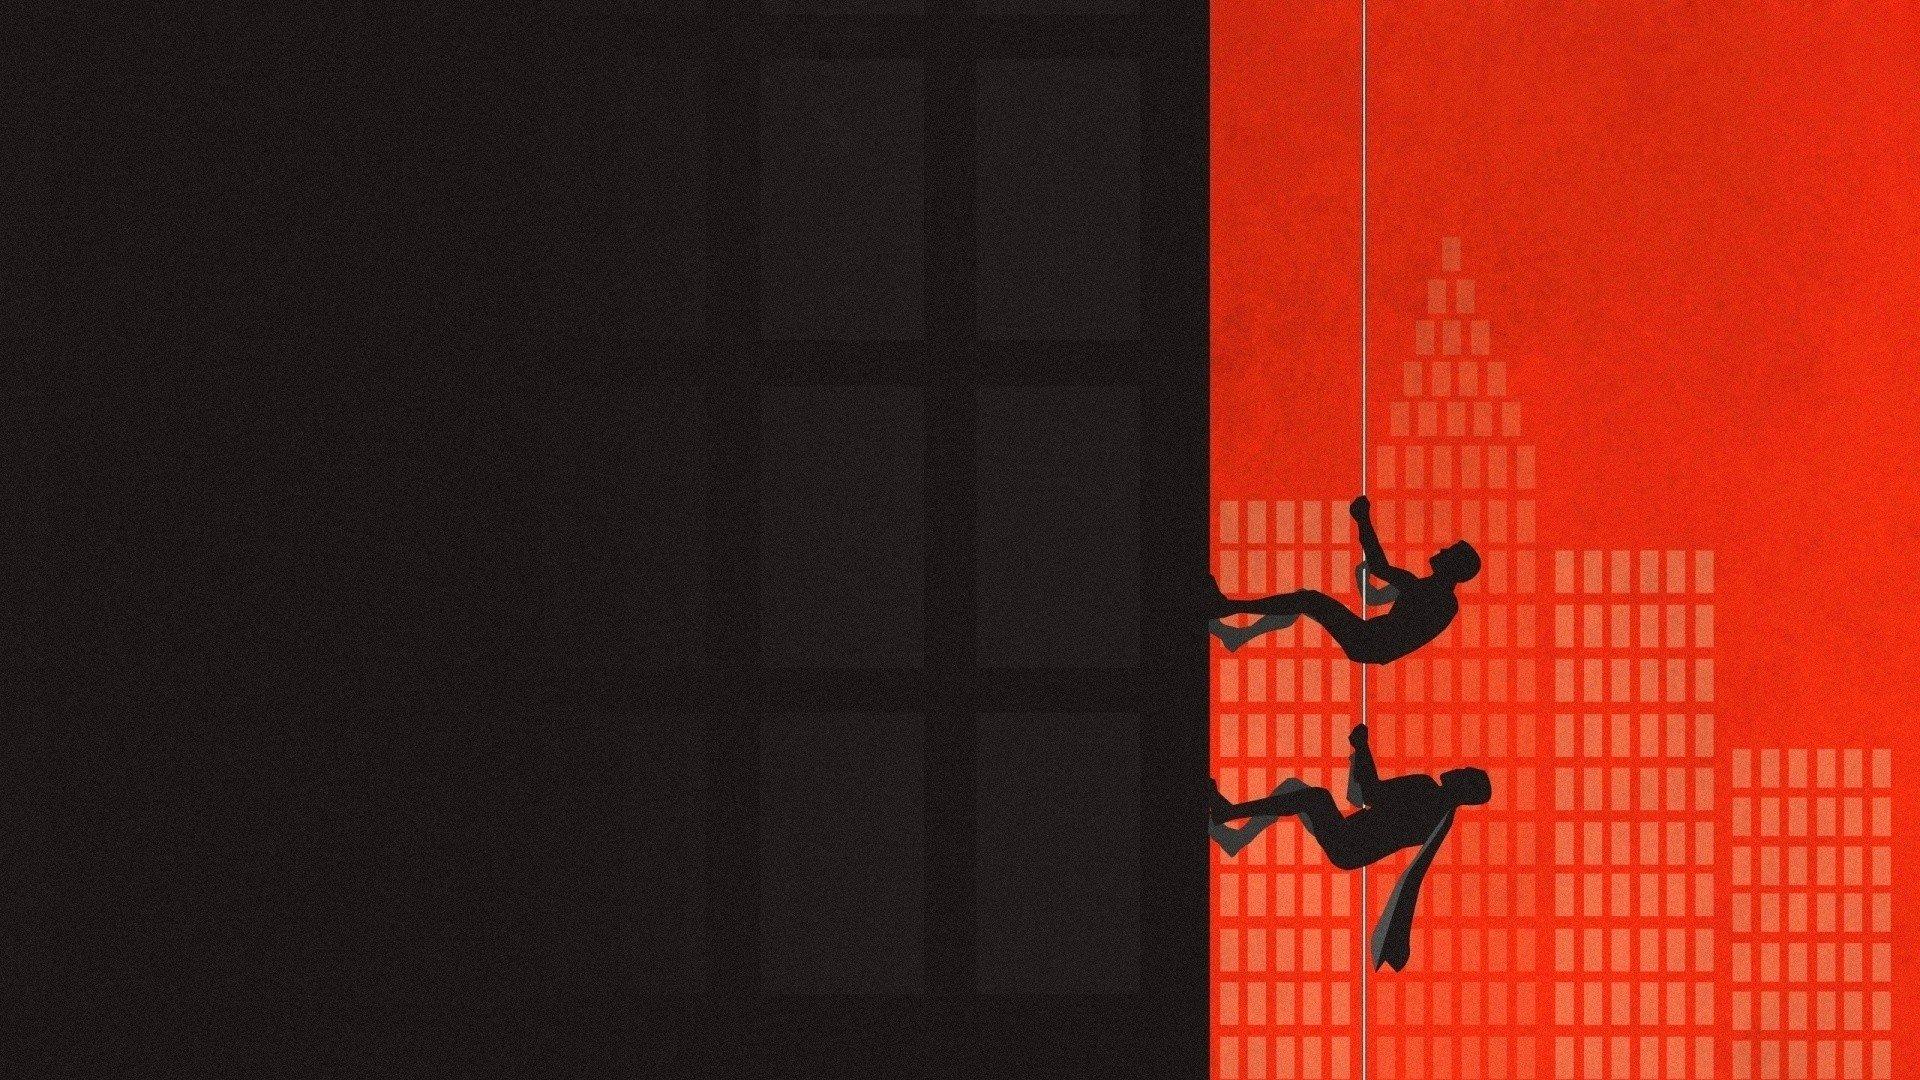 Marvel Iphone 7 Wallpaper Batman Amp Robin Full Hd Wallpaper And Background Image